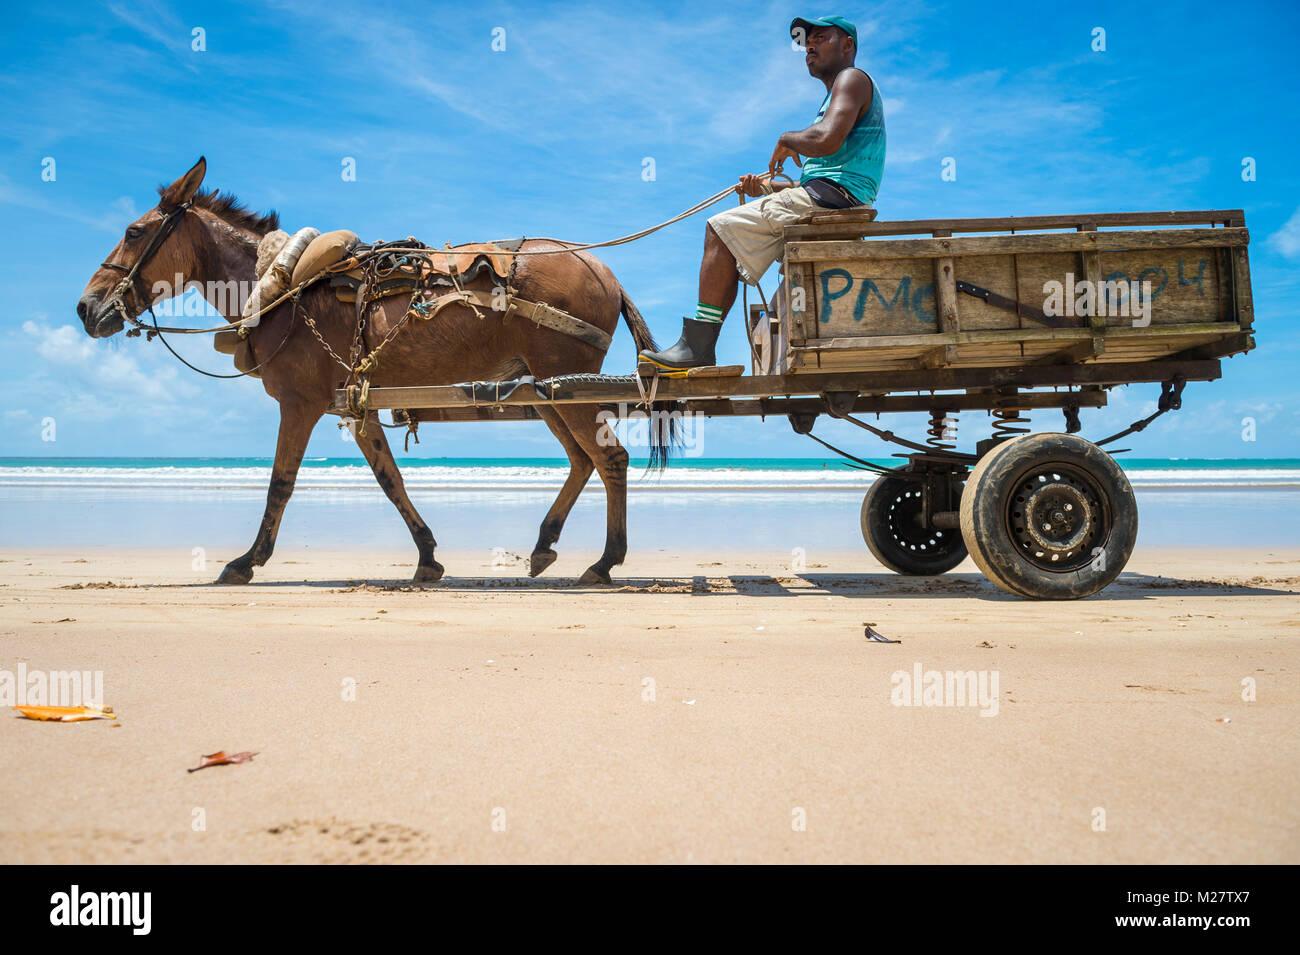 CAIRU, BRAZIL - MARCH 11, 2017: A mule pulls a wooden cart along the shore of a northeastern beach. - Stock Image